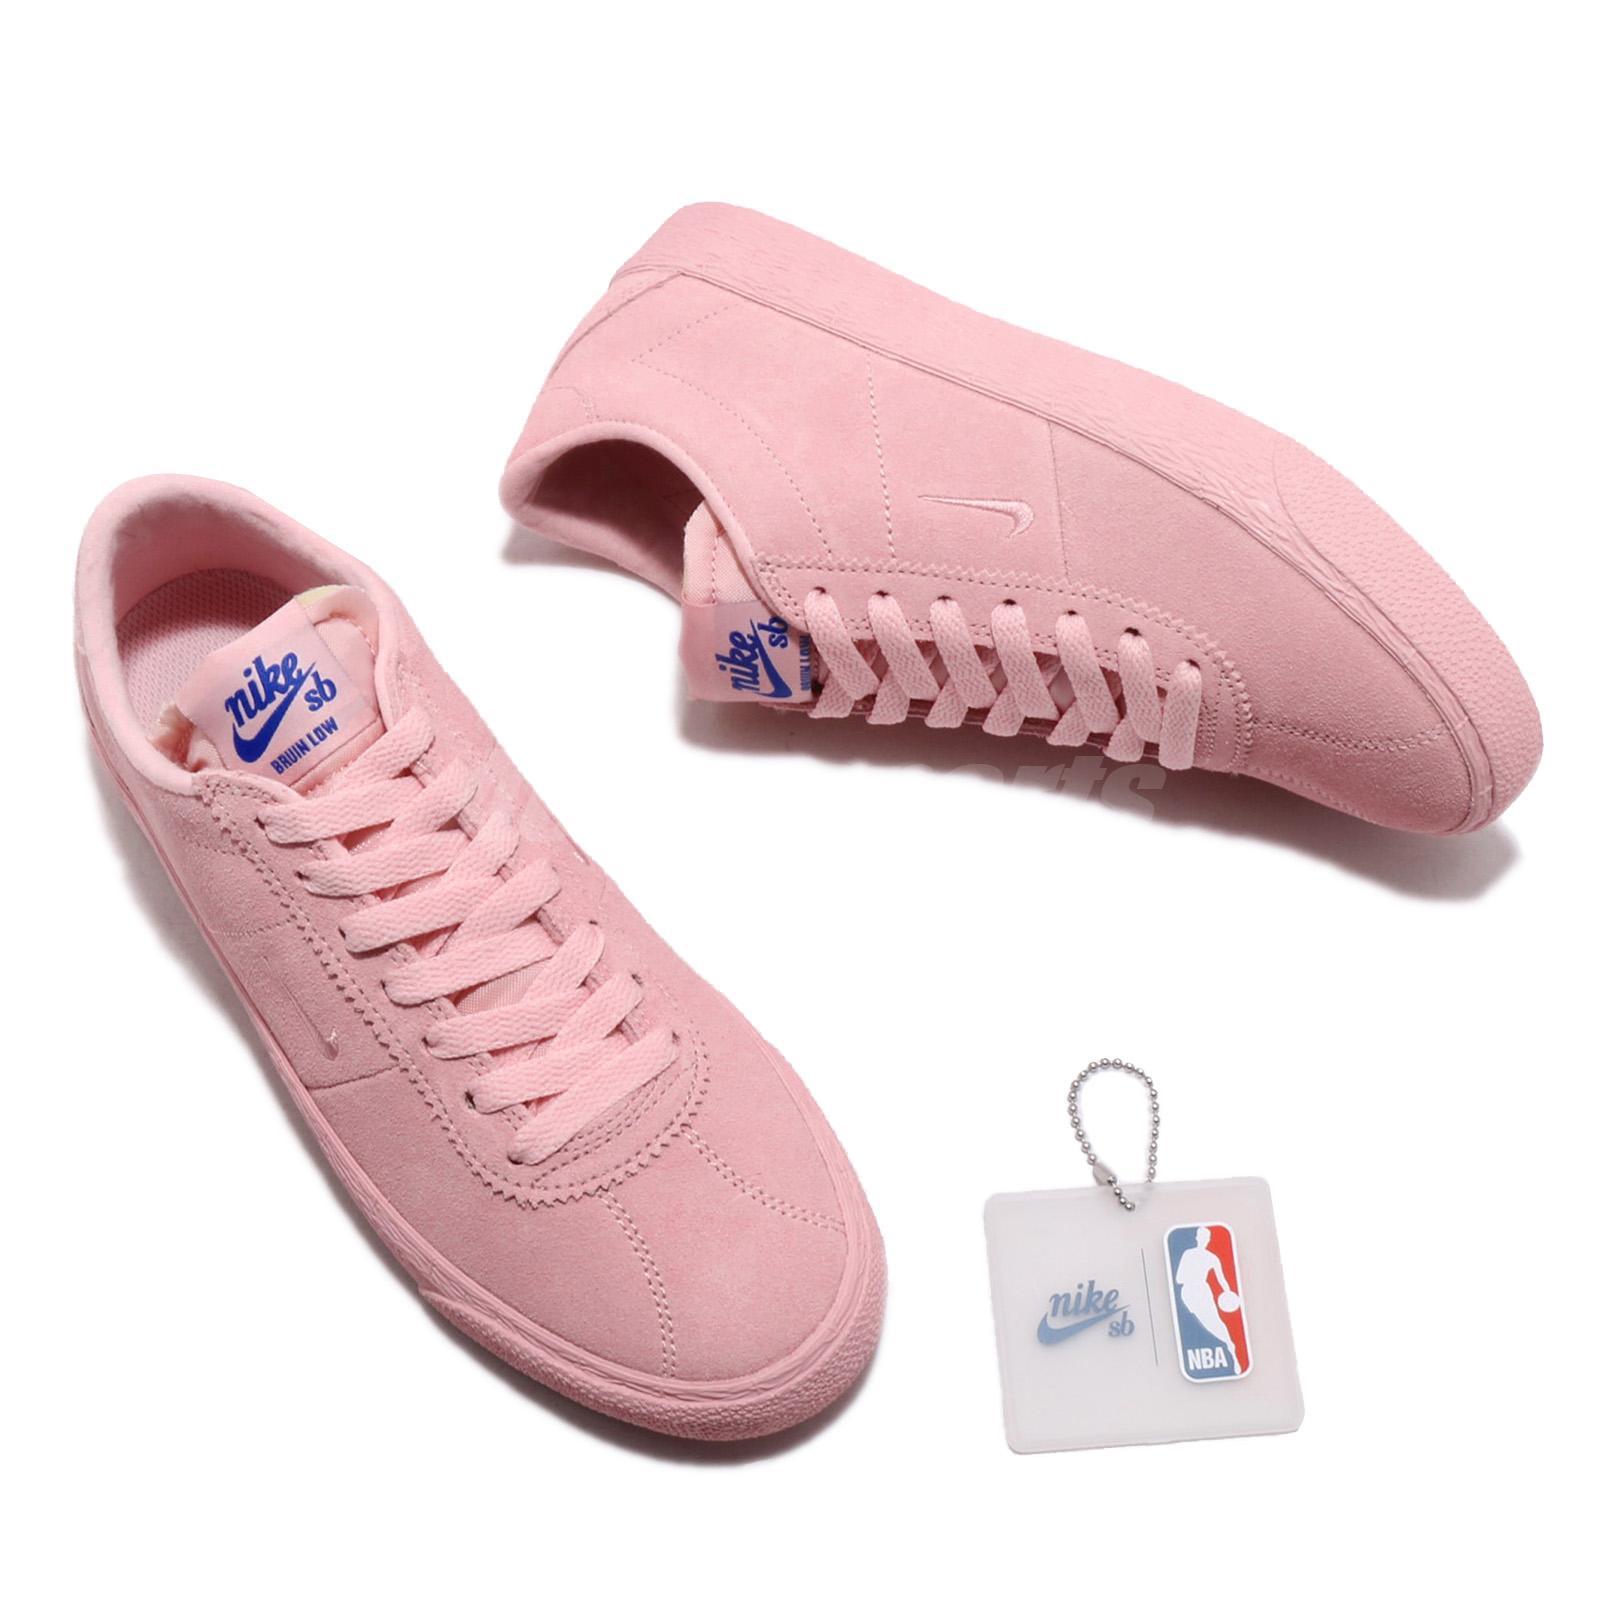 1d215ceefc190 Nike SB Zoom Bruin NBA Bubblegum Men Skate Boarding Shoes Sneakers ...